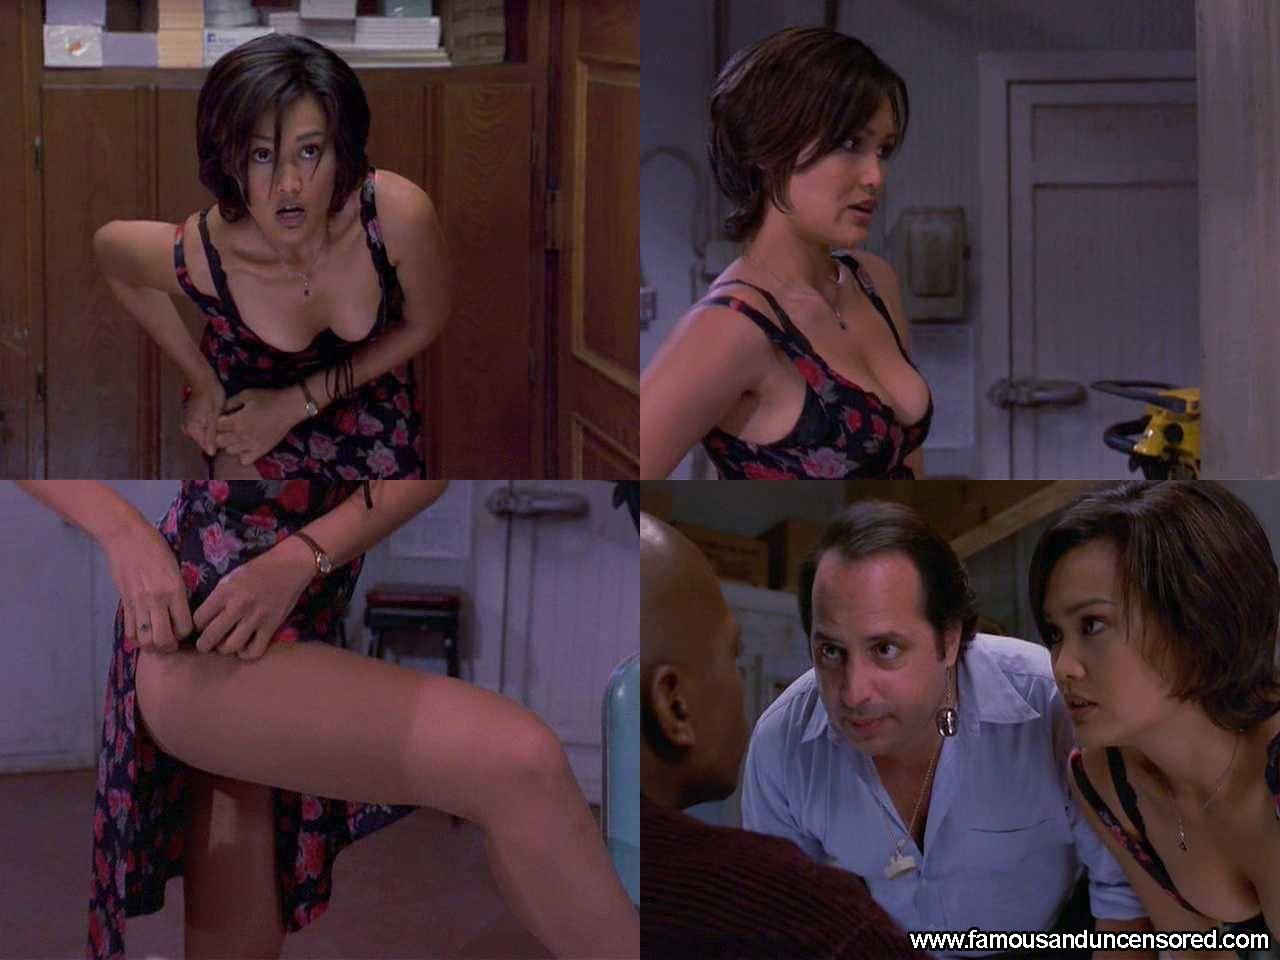 Sex scene carrere tia Tia Carrere